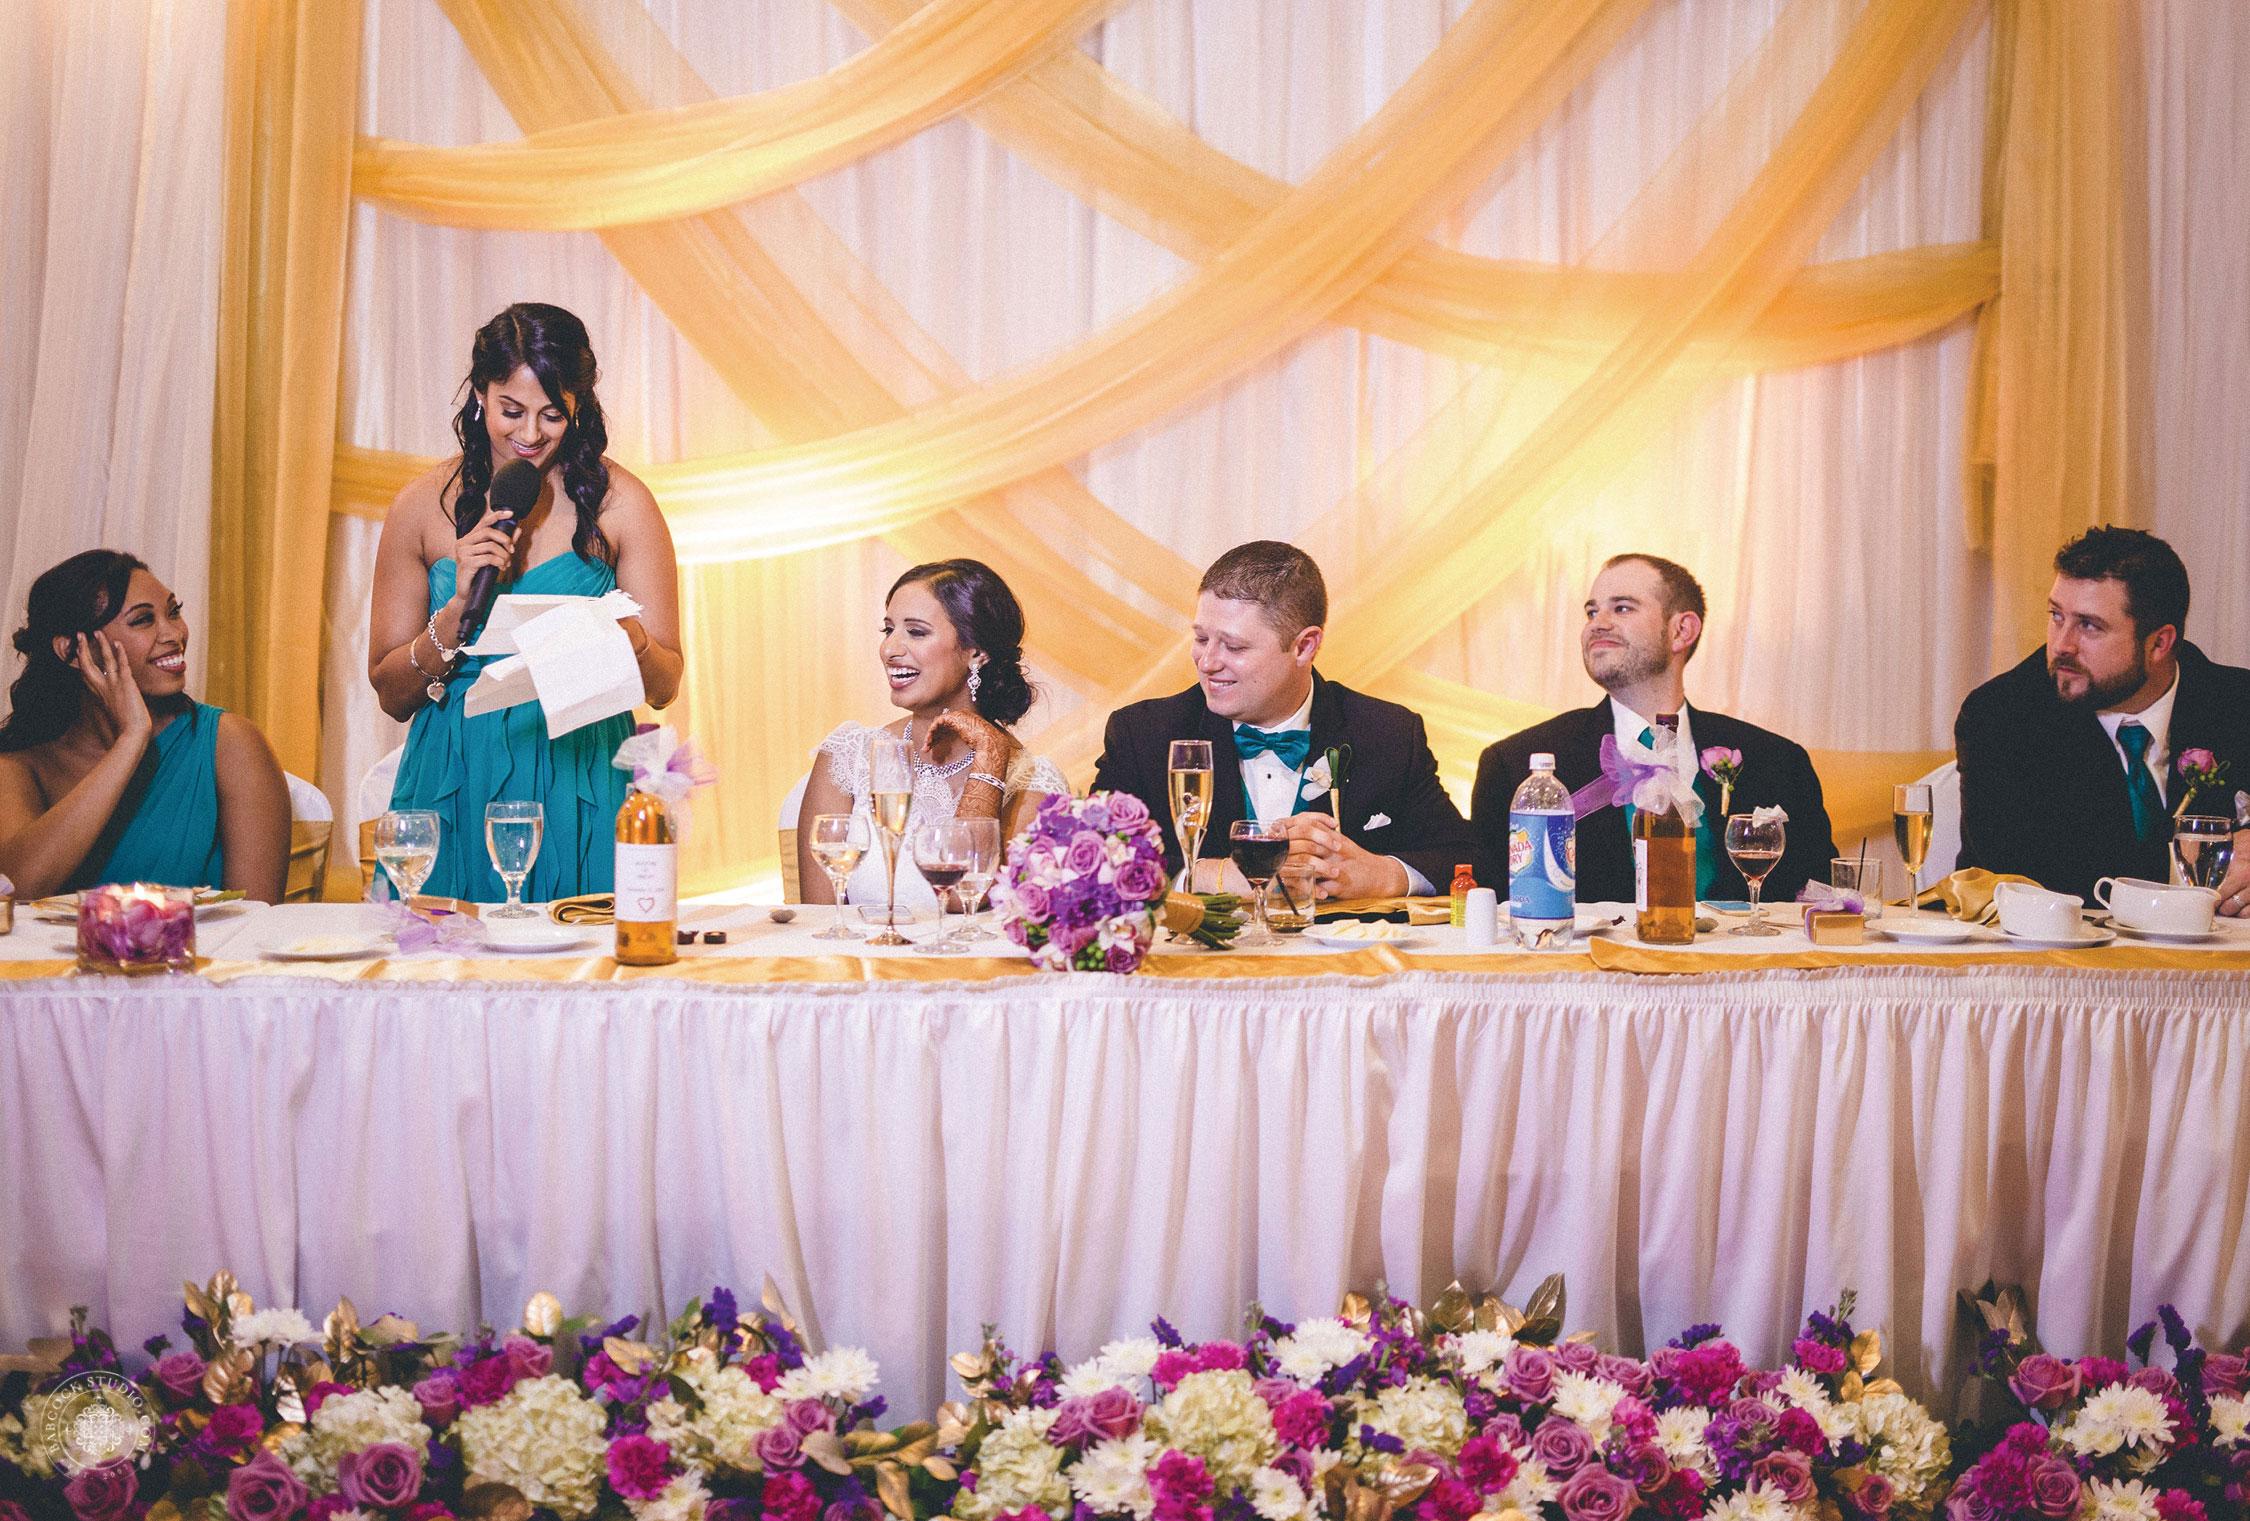 mayuri-brent-indian-wedding-photographer-dayton-ohio-41.jpg